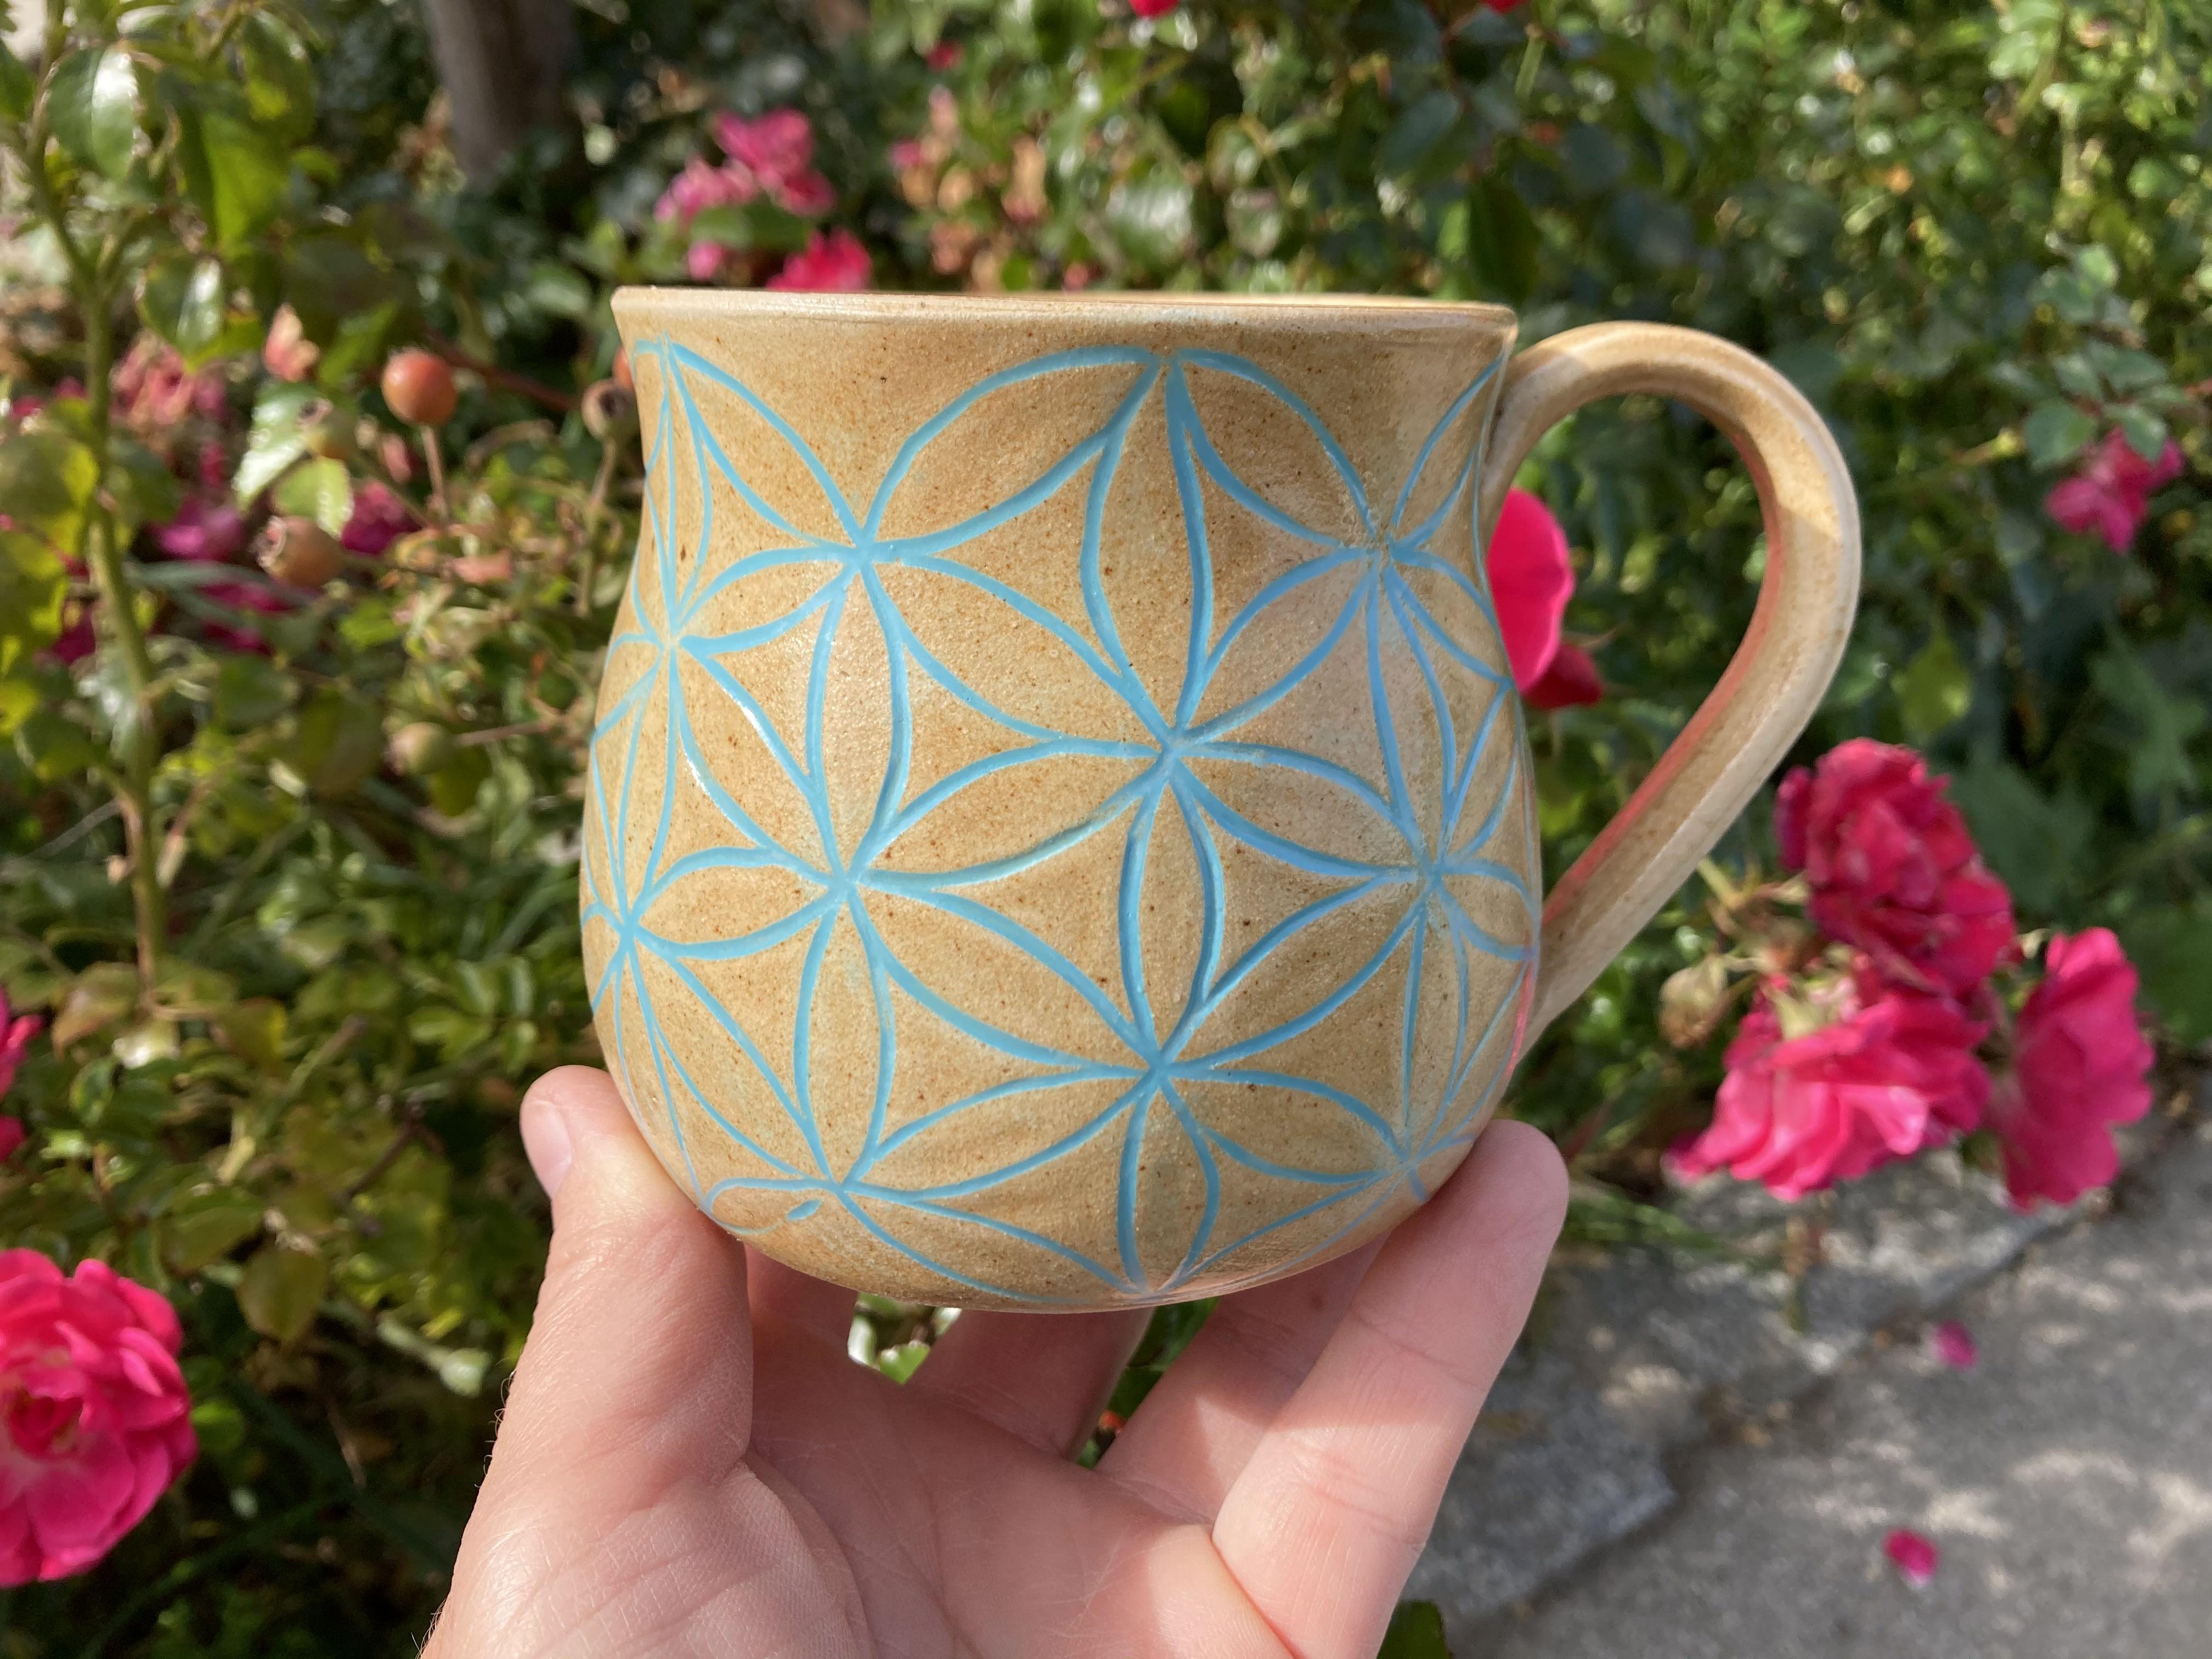 Tasse Blume des Lebens aus Agnihotra-Keramik